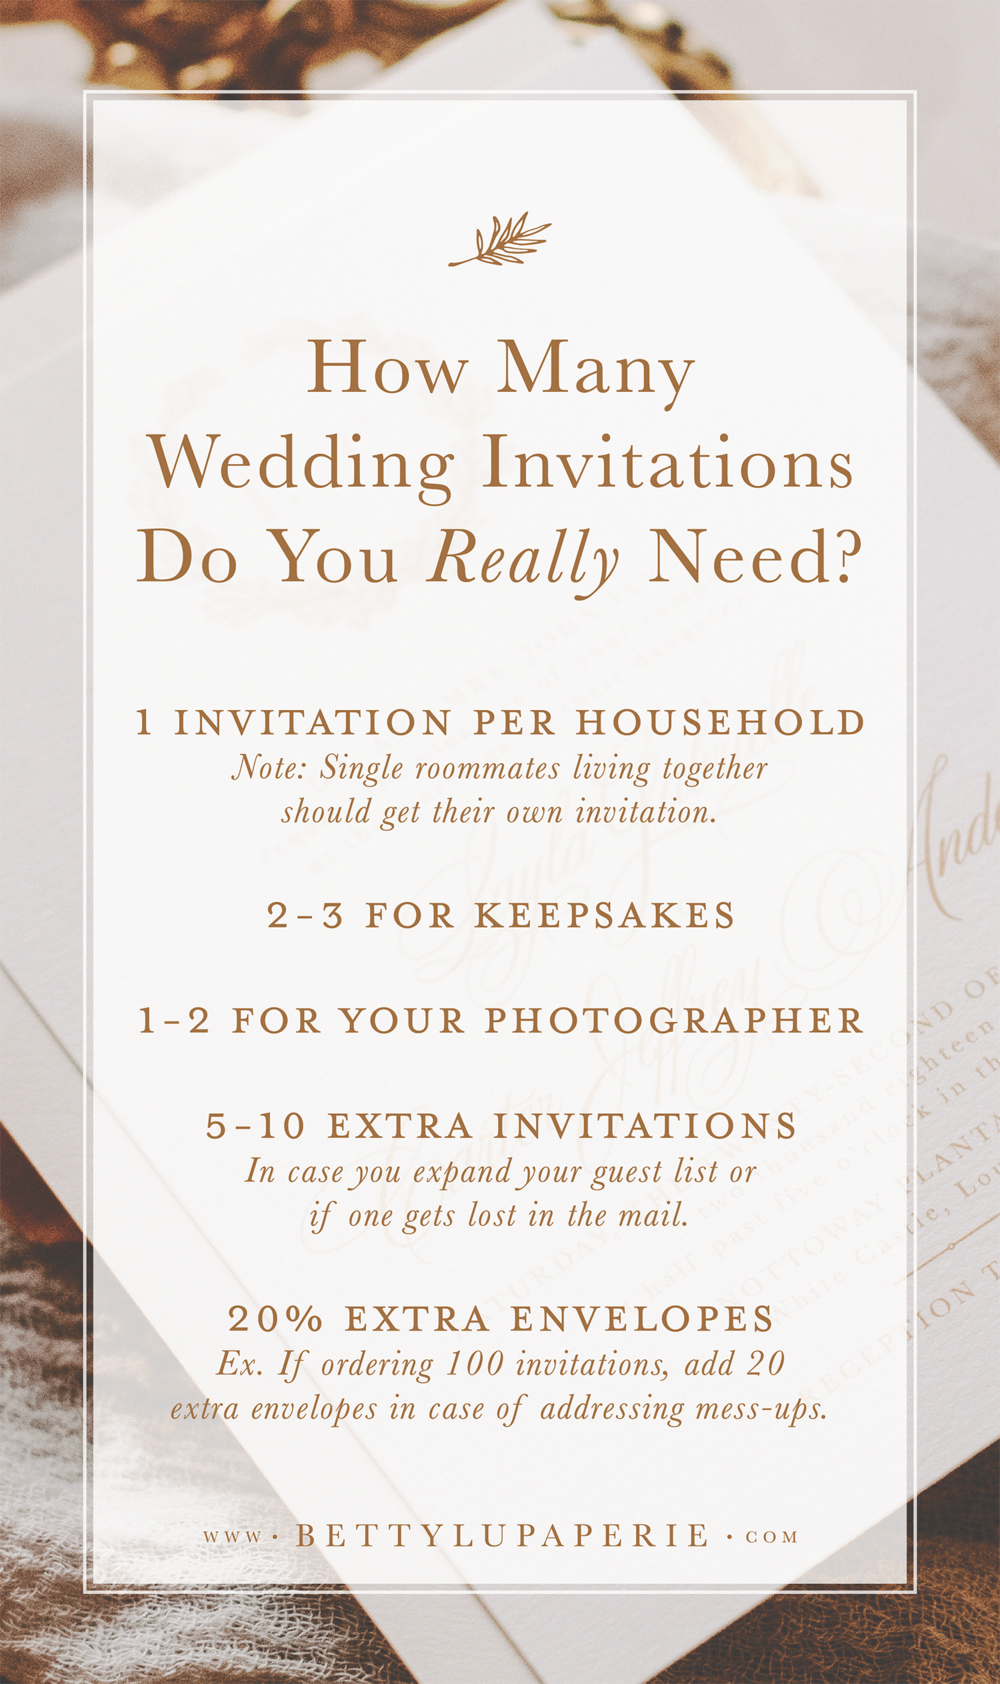 Wedding Plans 7285 Weddingplans Future Wedding Plans Floral Wedding Invitations Wedding Planning Tips